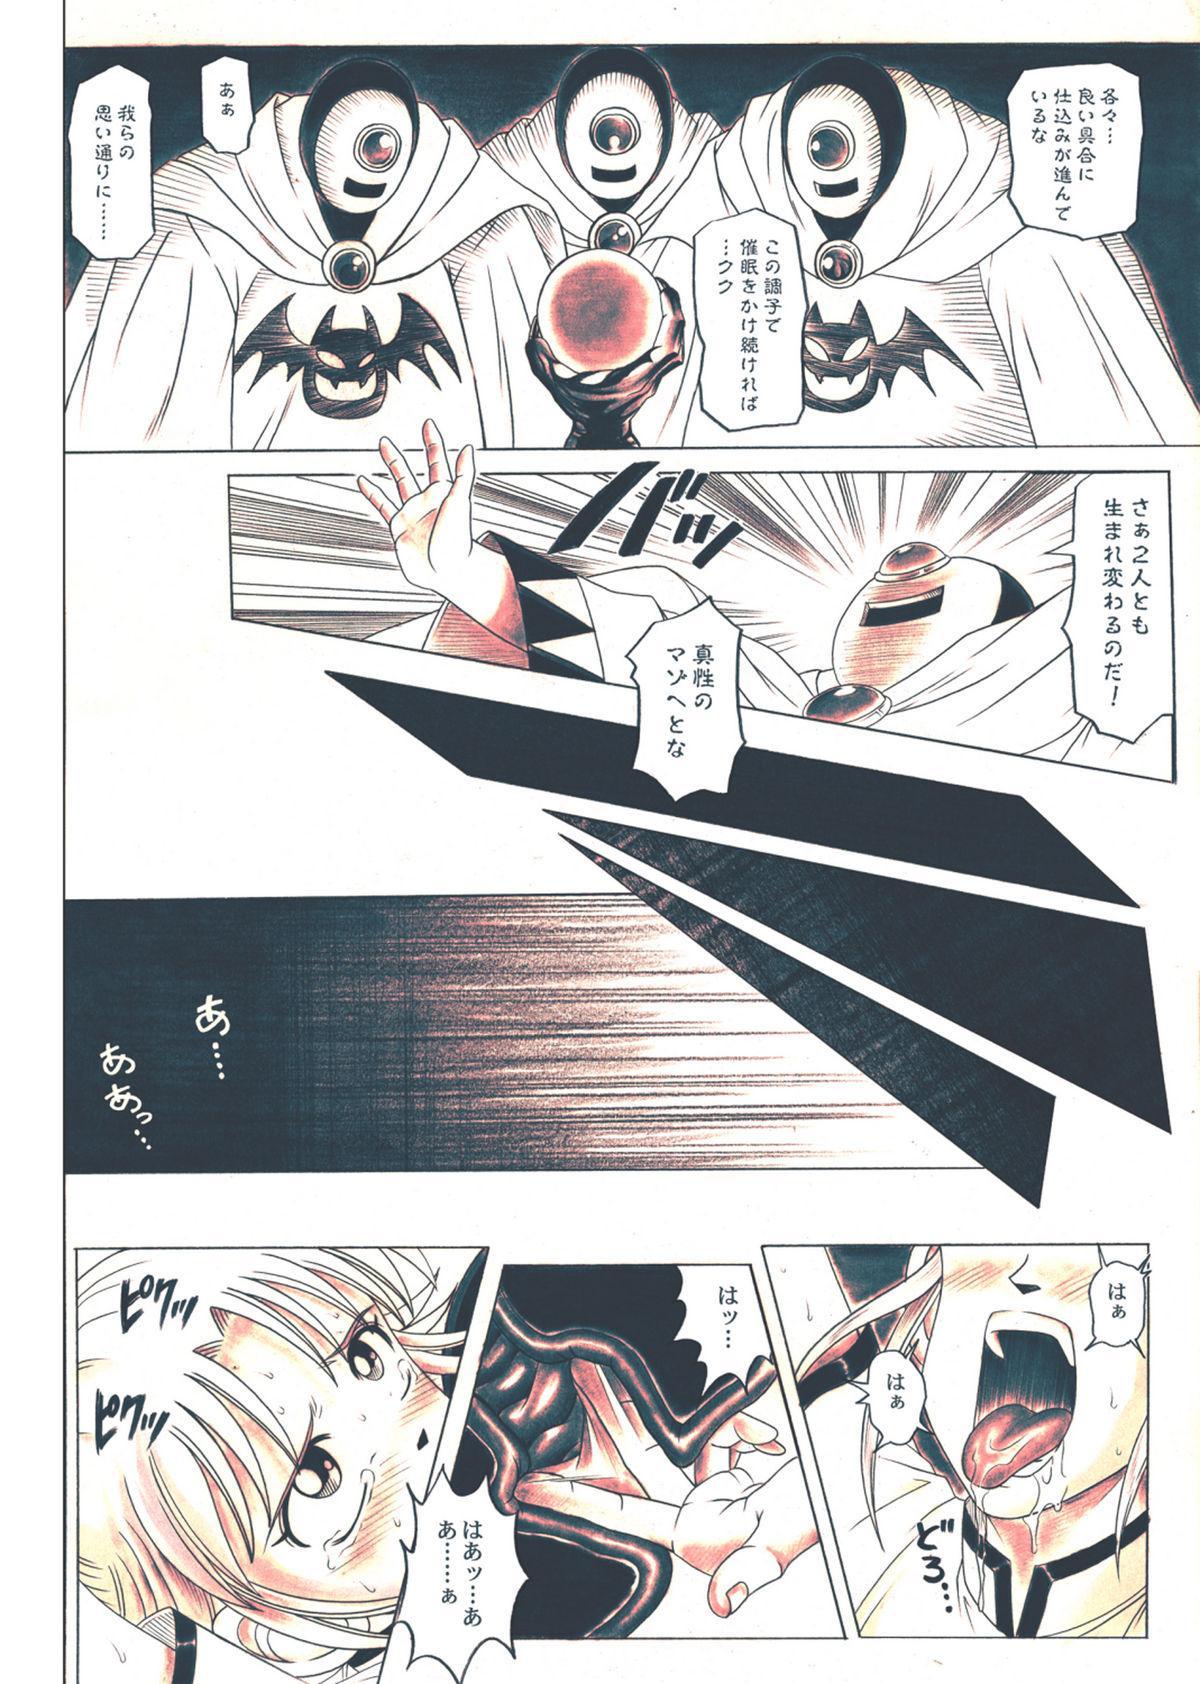 [Cyclone (Reizei, Izumi)] STAR TAC IDO ~Youkuso Haja no Doukutsu he~ Chuuhen Download edition (Dragon Warrior: Dai's Great Adventure) [Digital] 123